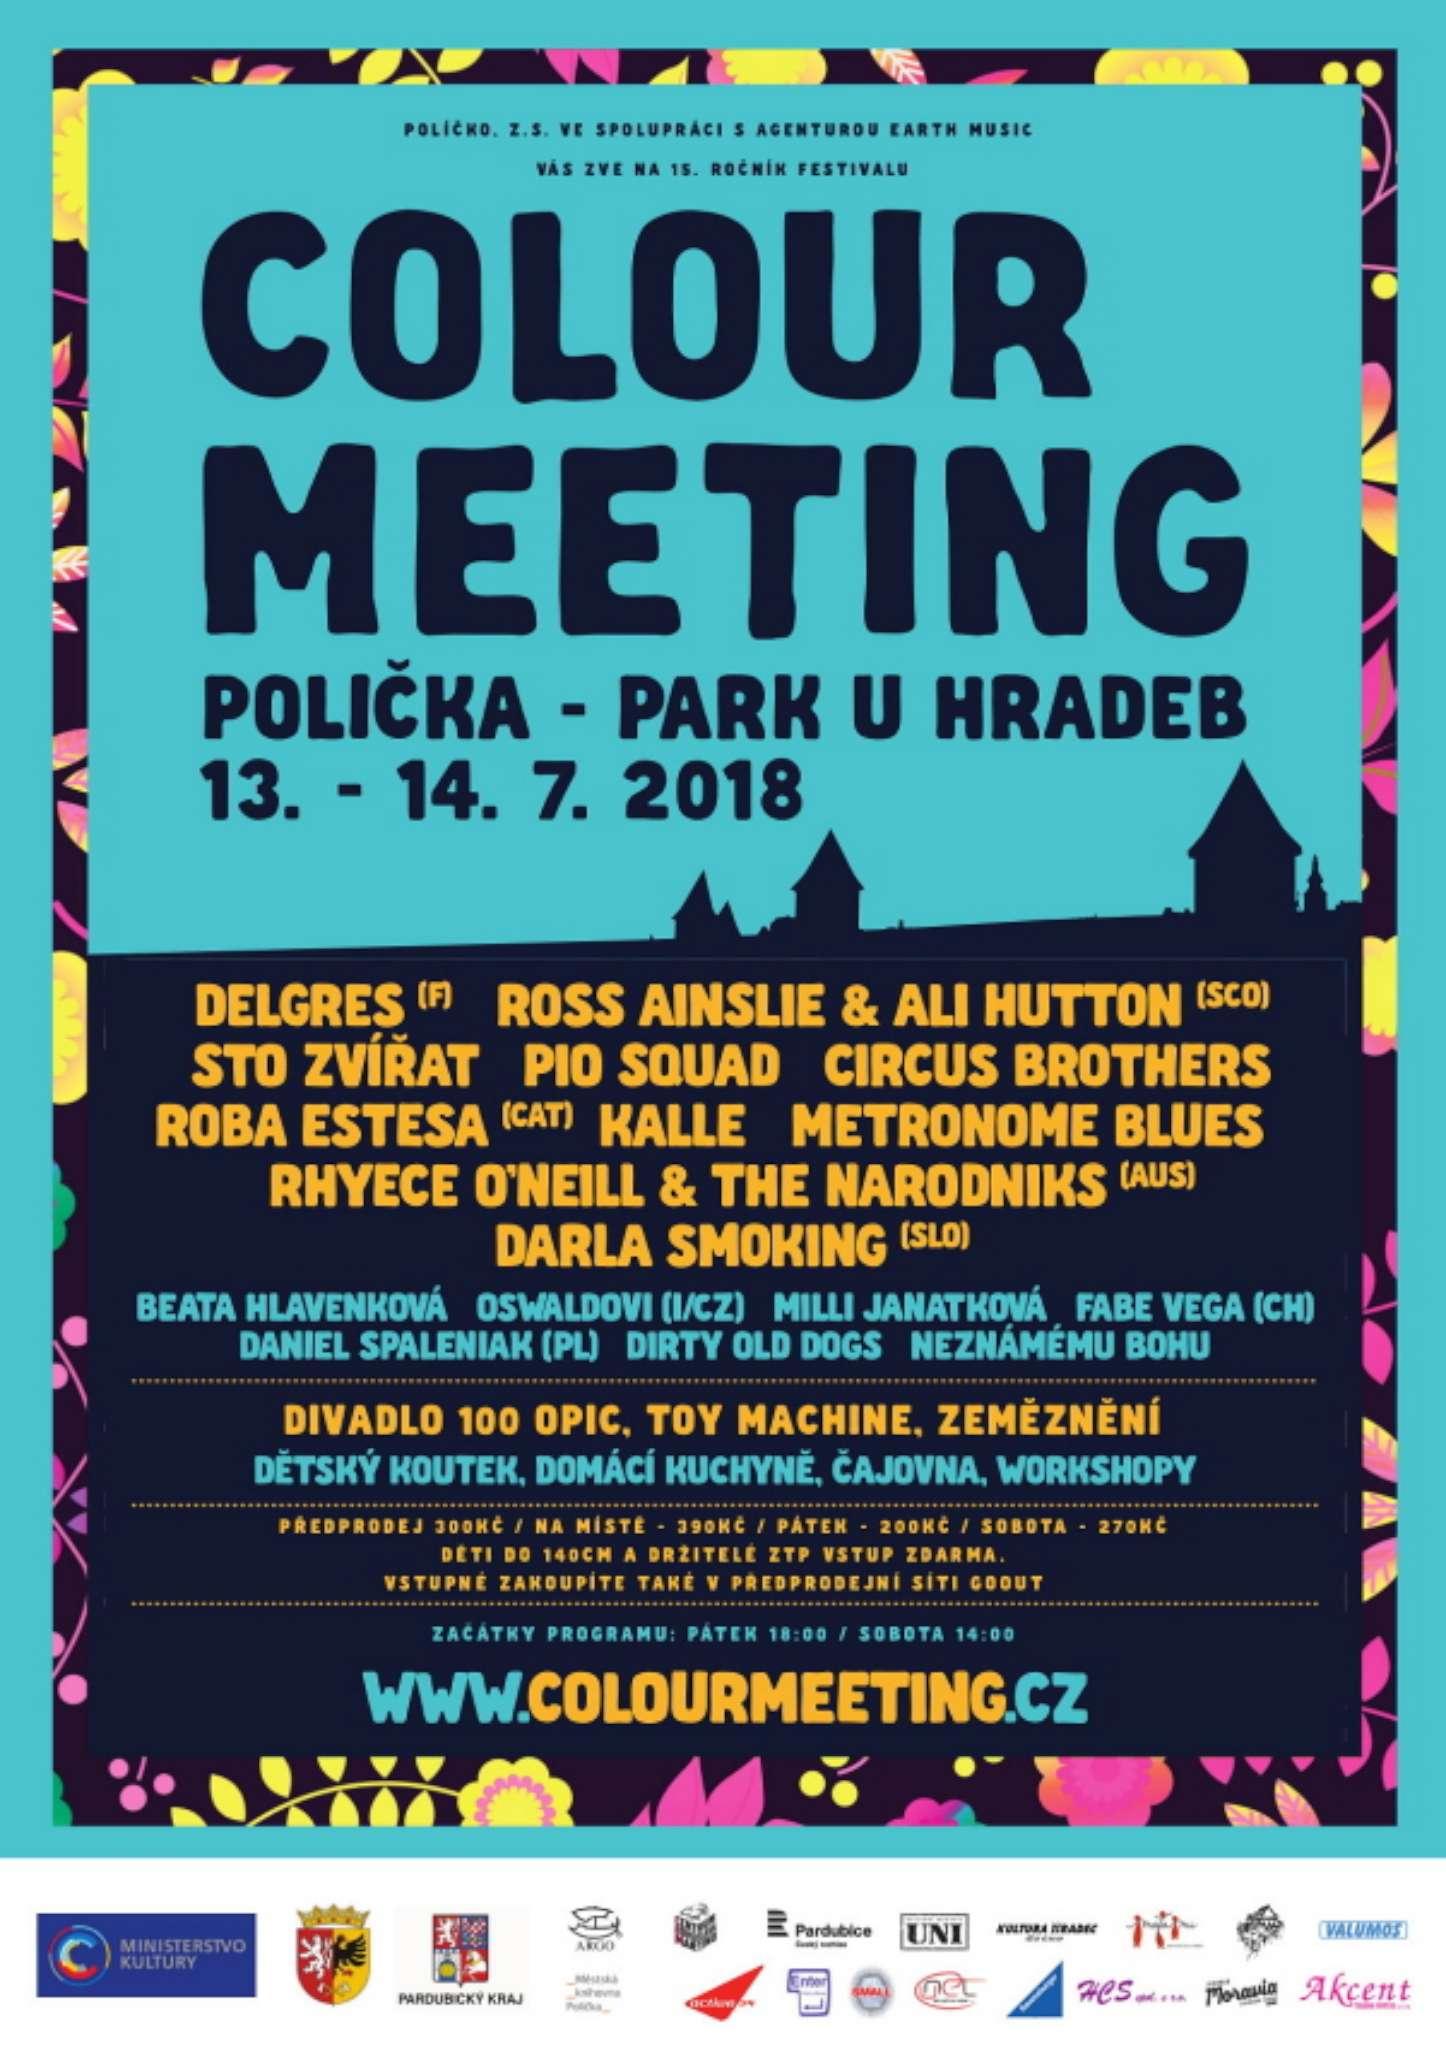 color-meeting-policka